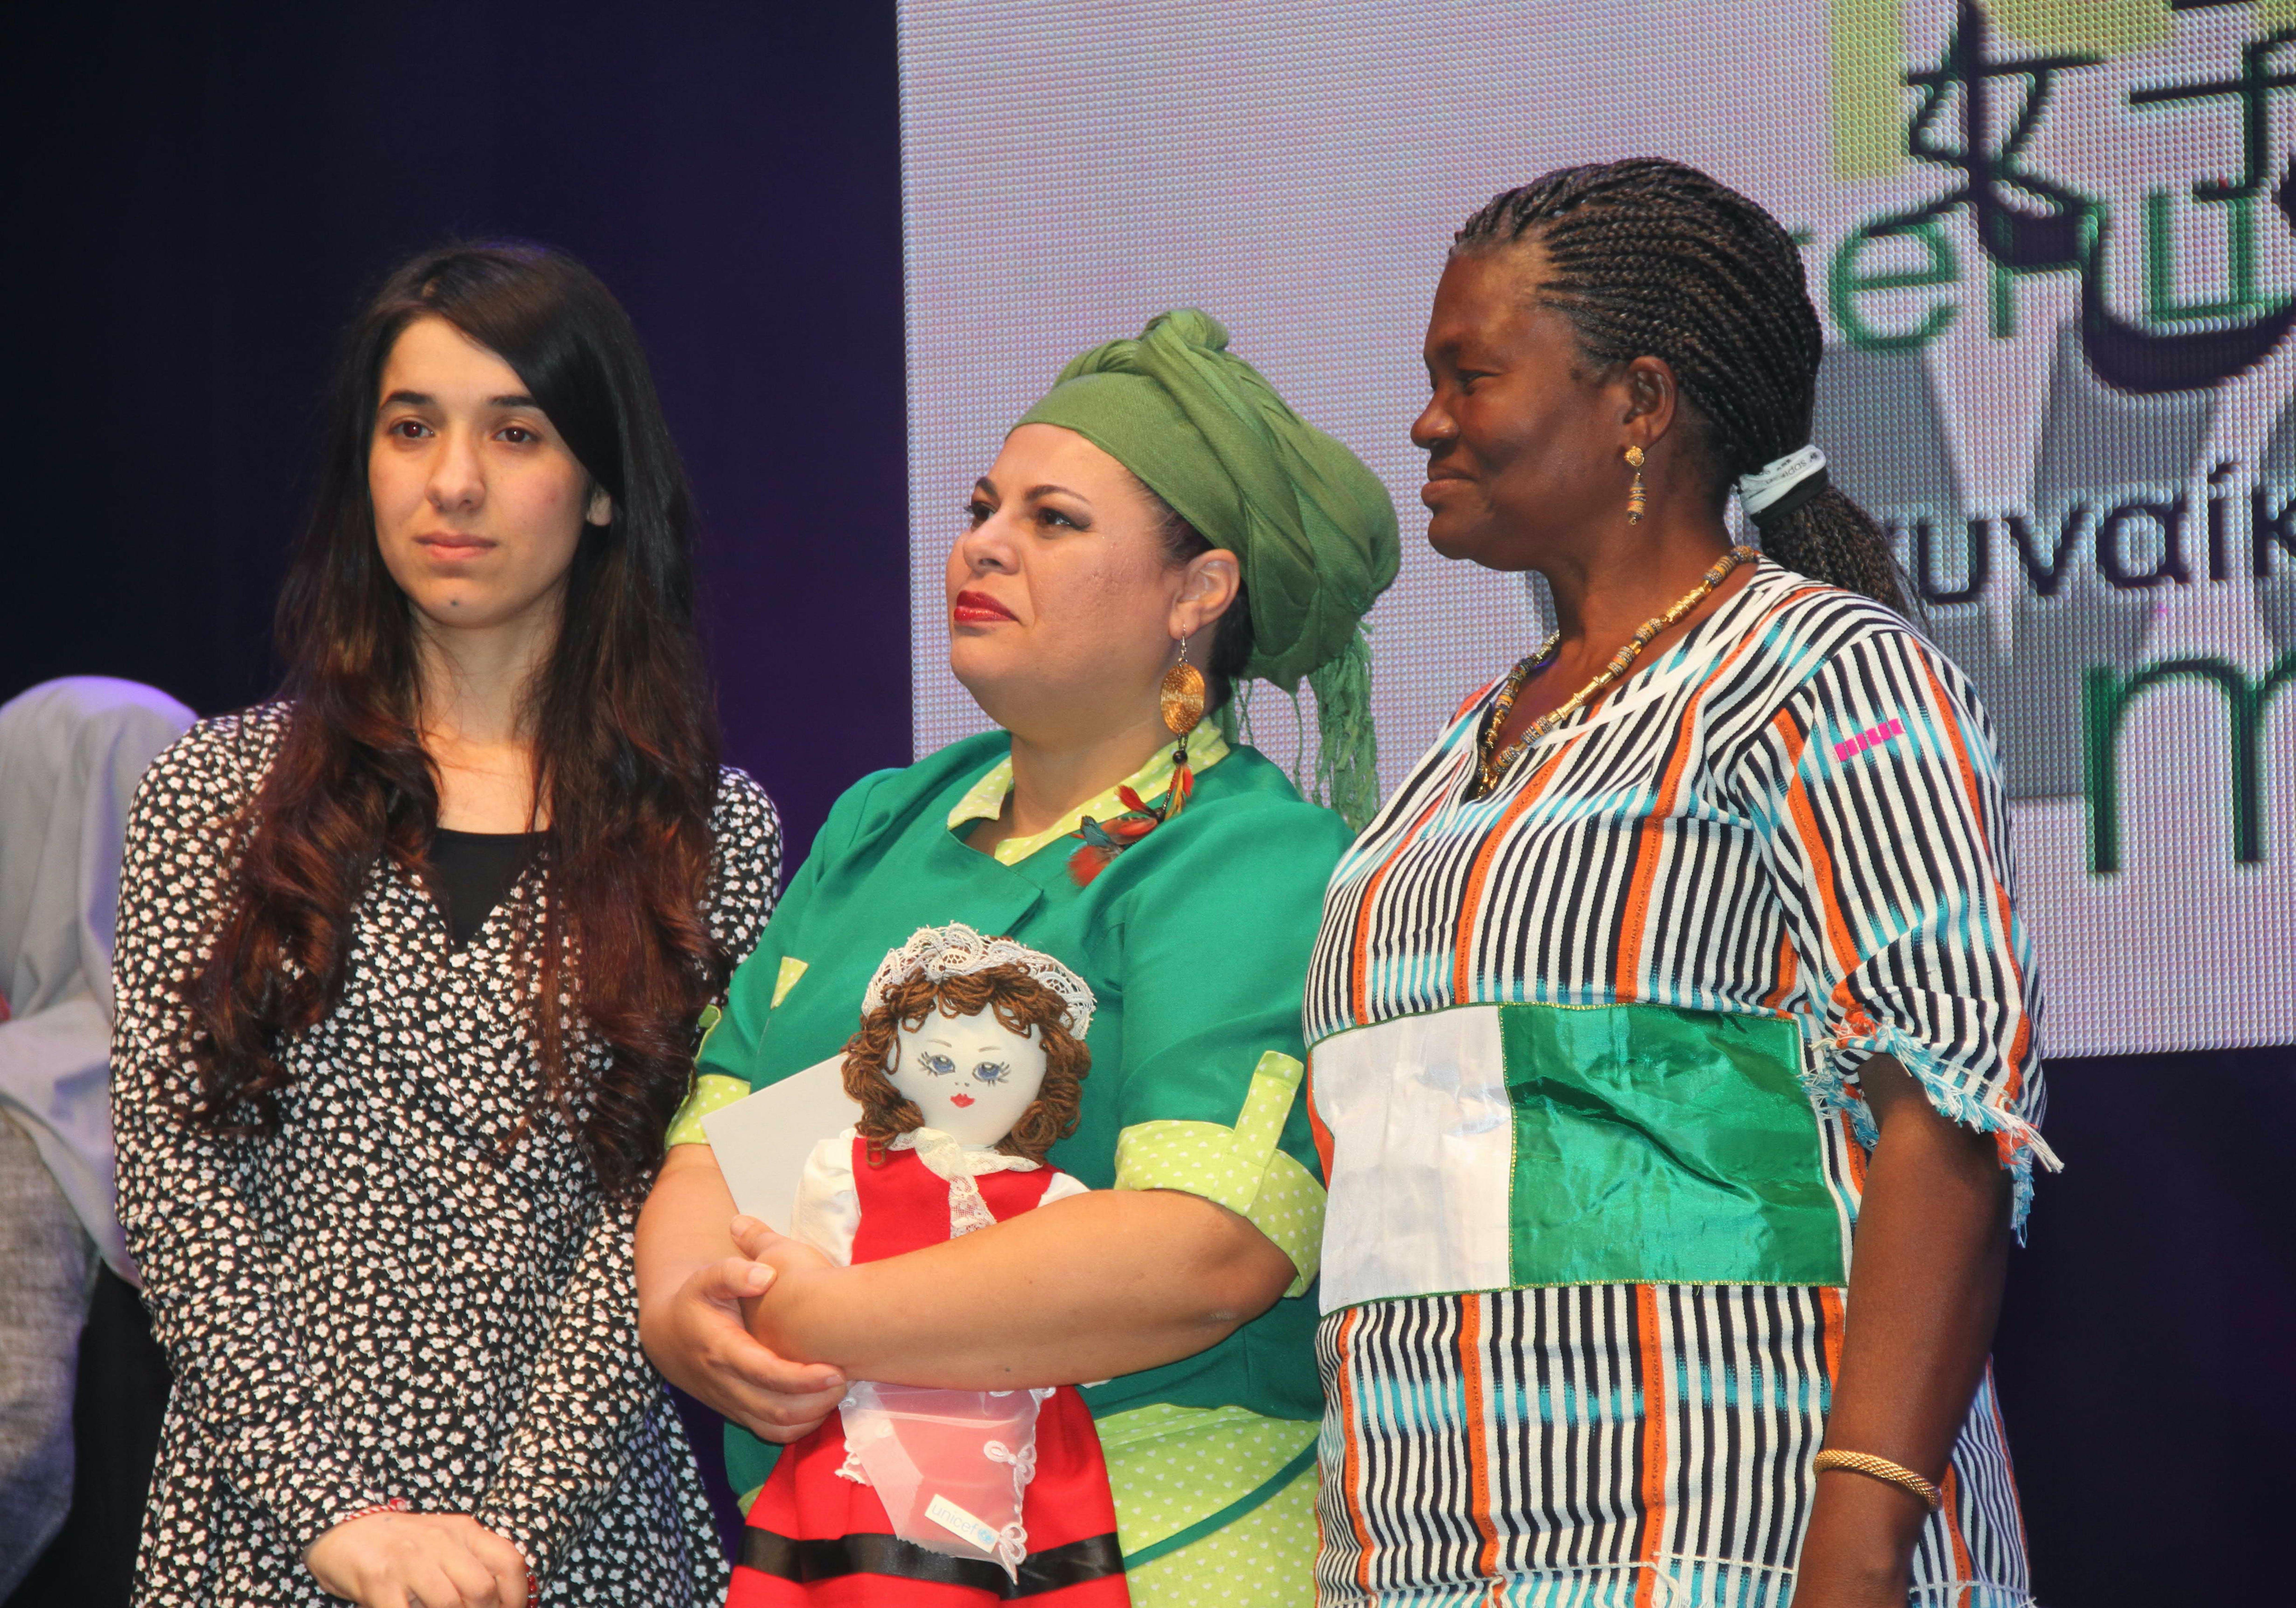 Yazida Nadia Murad Basee Taha con la Pigotta